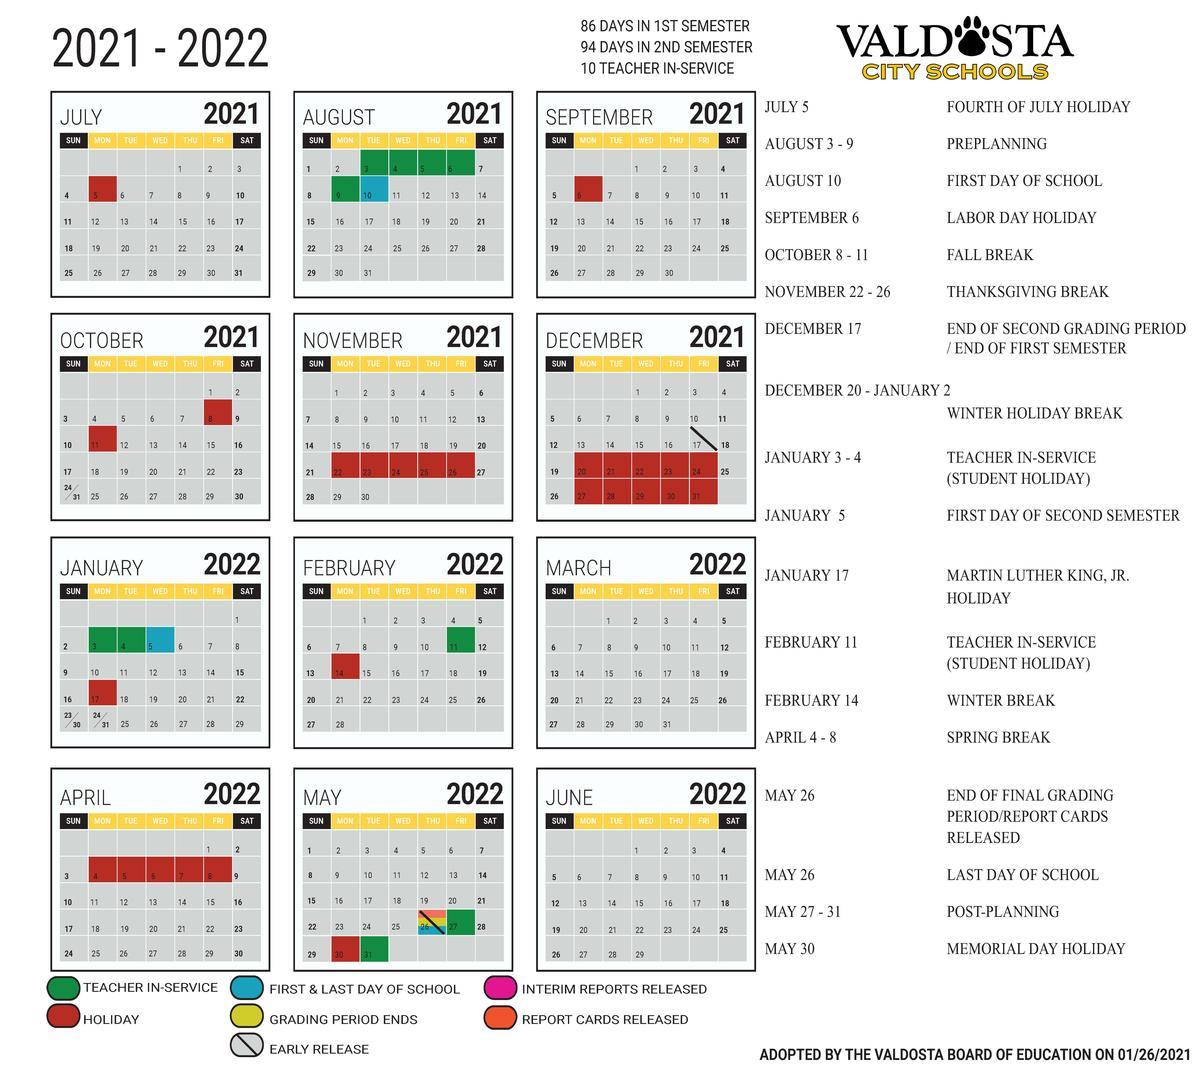 Uga Academic Calendar Fall 2022.Valdosta City School District